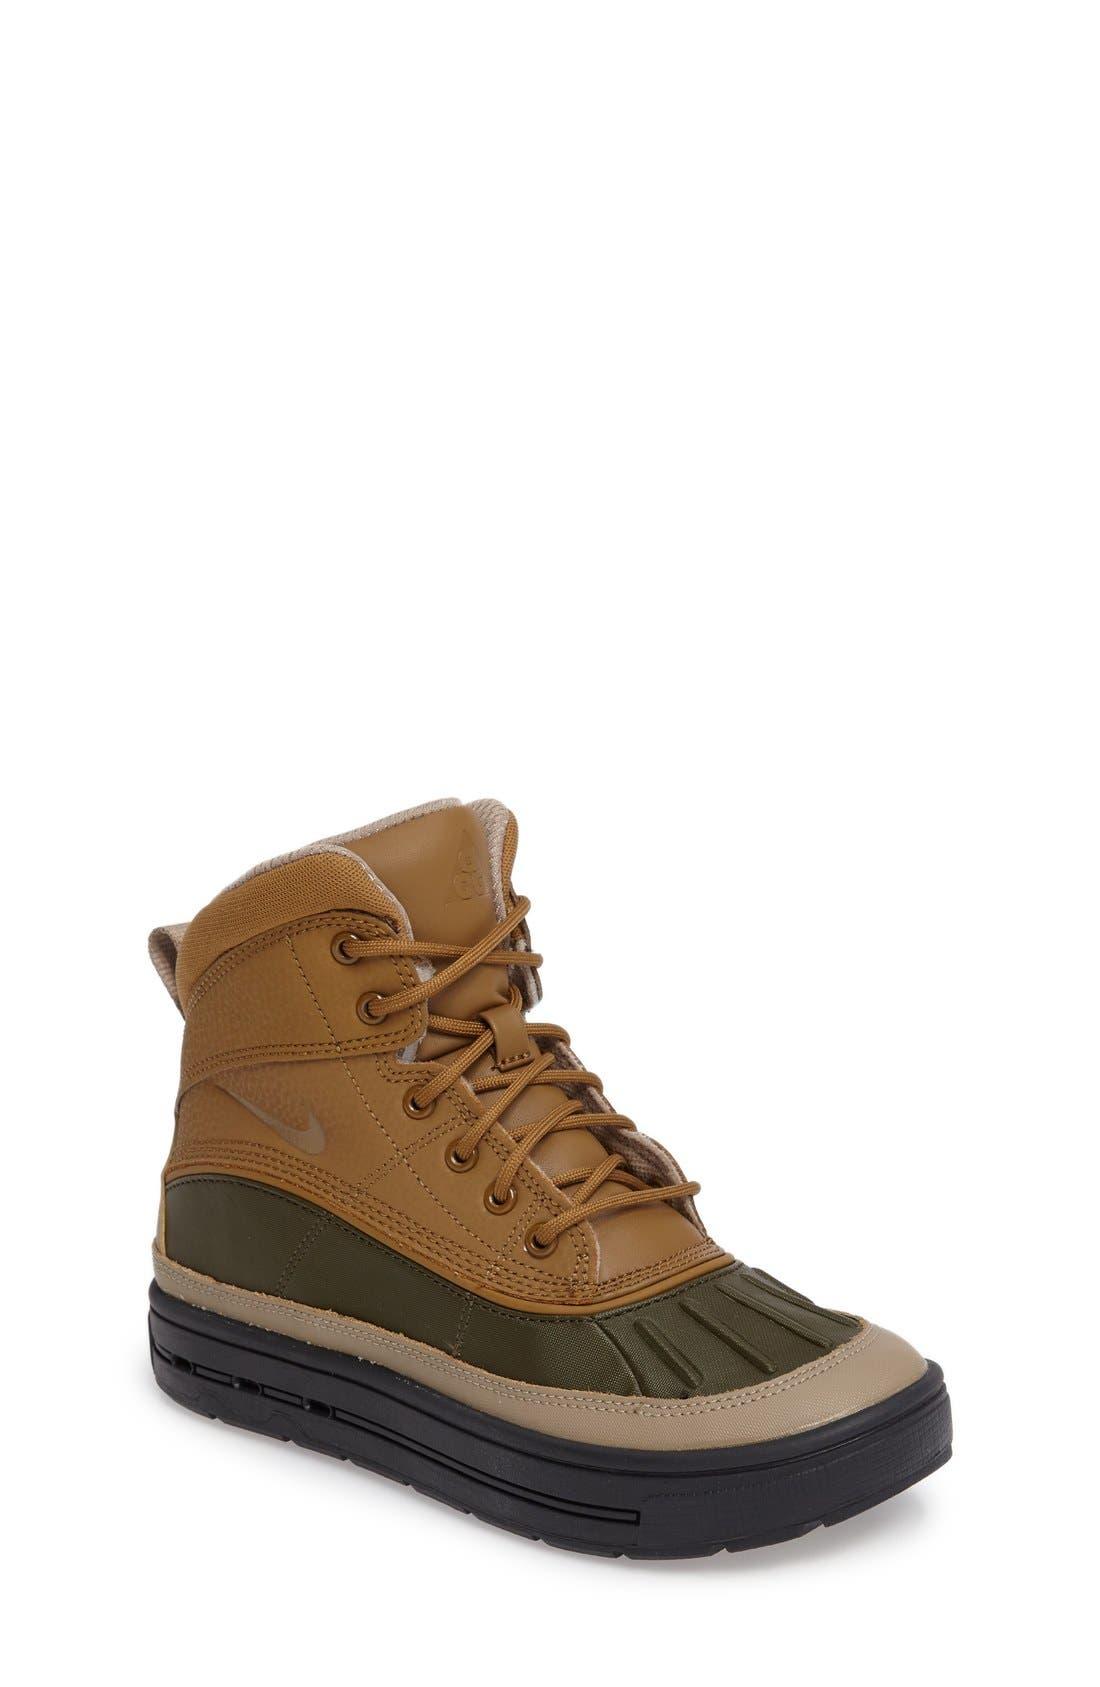 Alternate Image 1 Selected - Nike 'Woodside 2 High' Boot (Baby, Walker, Toddler, Little Kid & Big Kid)